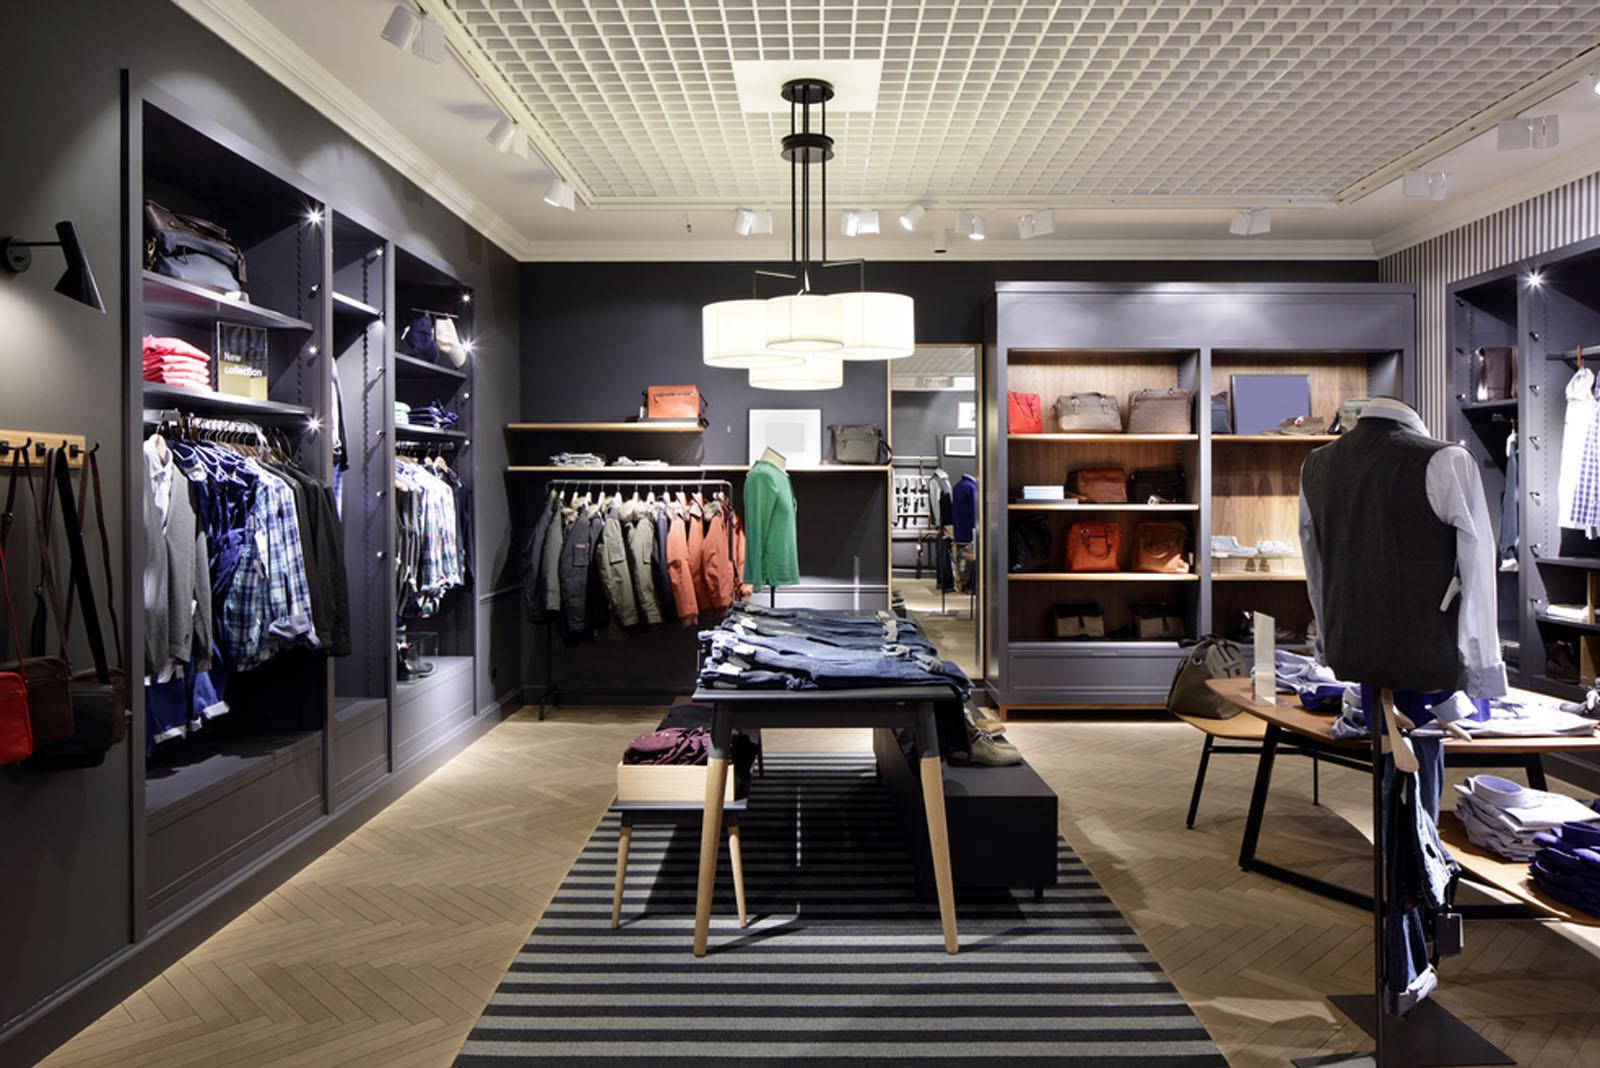 Showroom design Kincir Bali WP 2